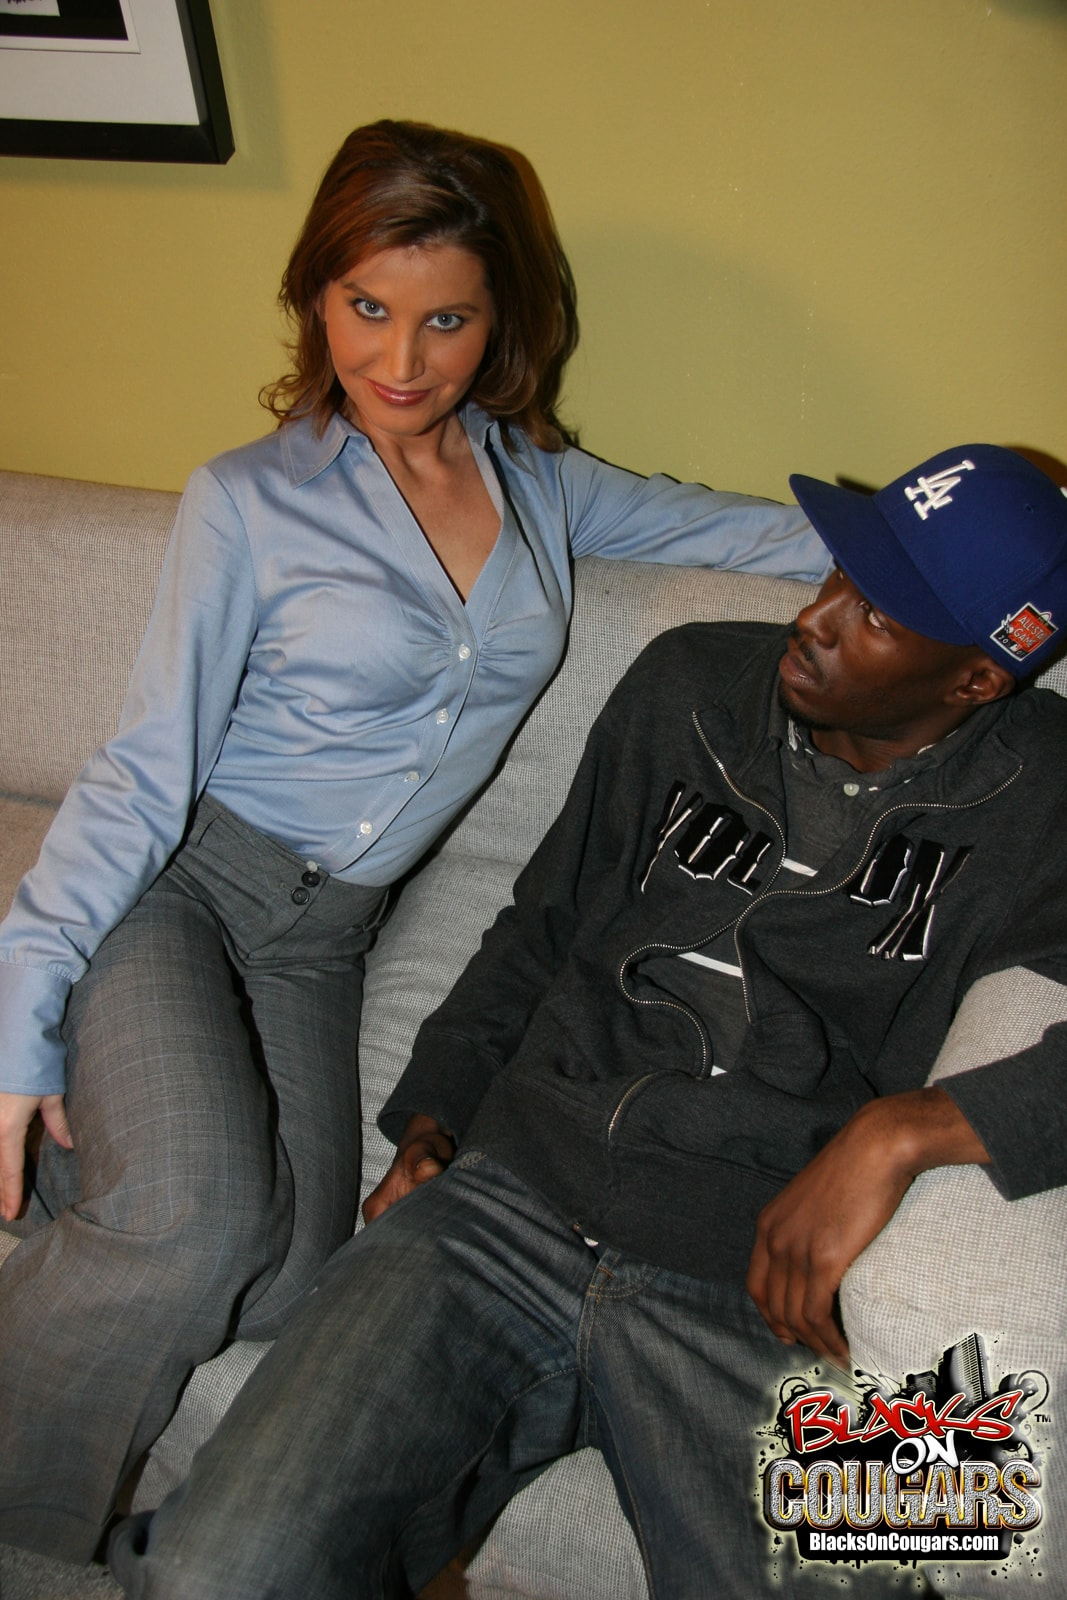 Dogfart '- Blacks On Cougars' starring Rae Rogers (Photo 7)